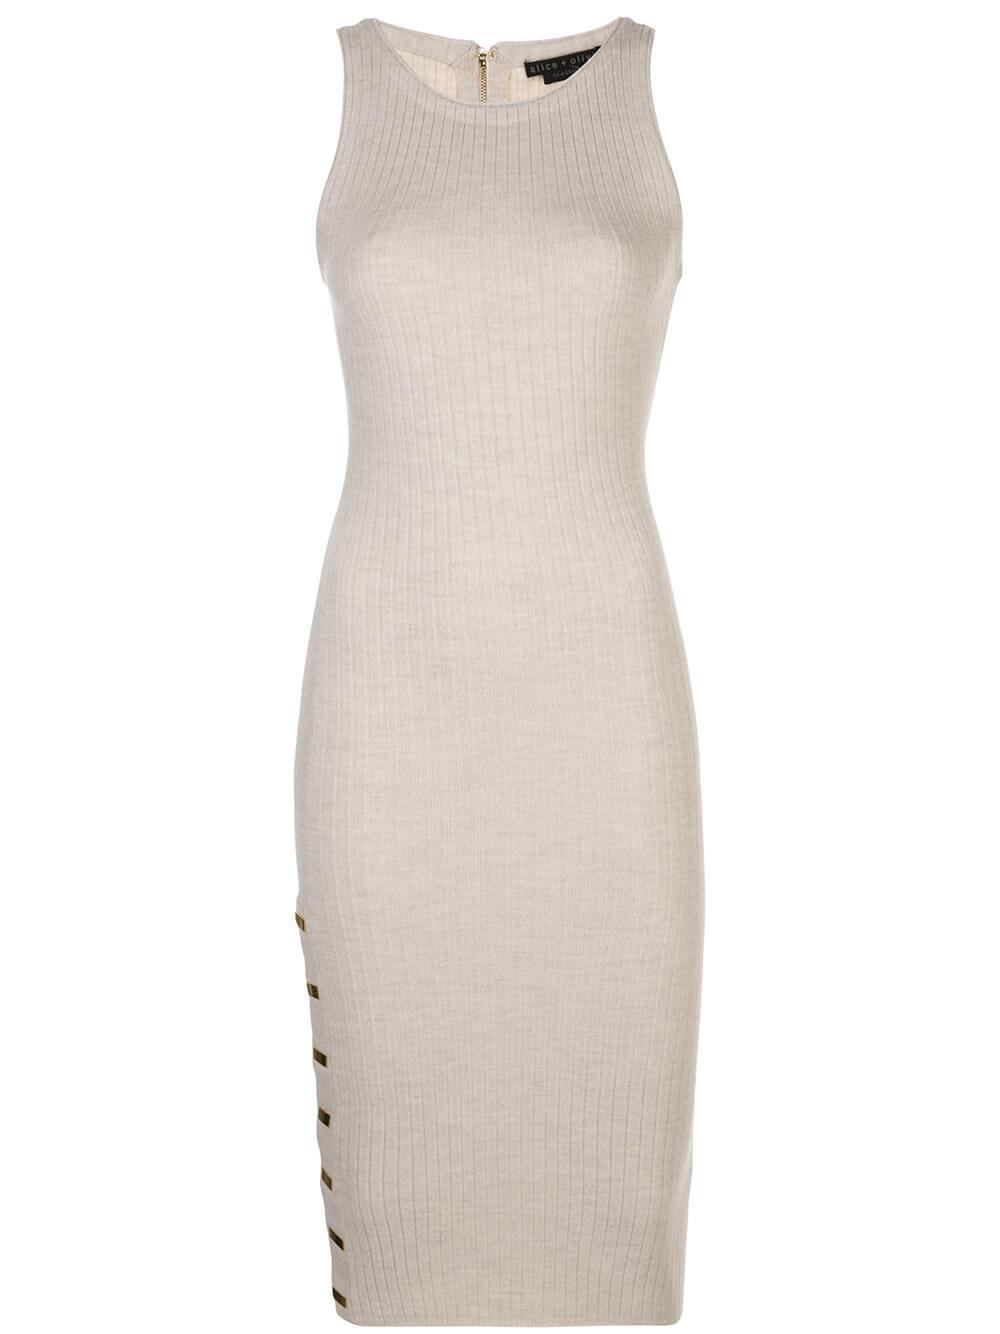 Jenner Crew Neck Slim Knit Dress Item # CL000533728